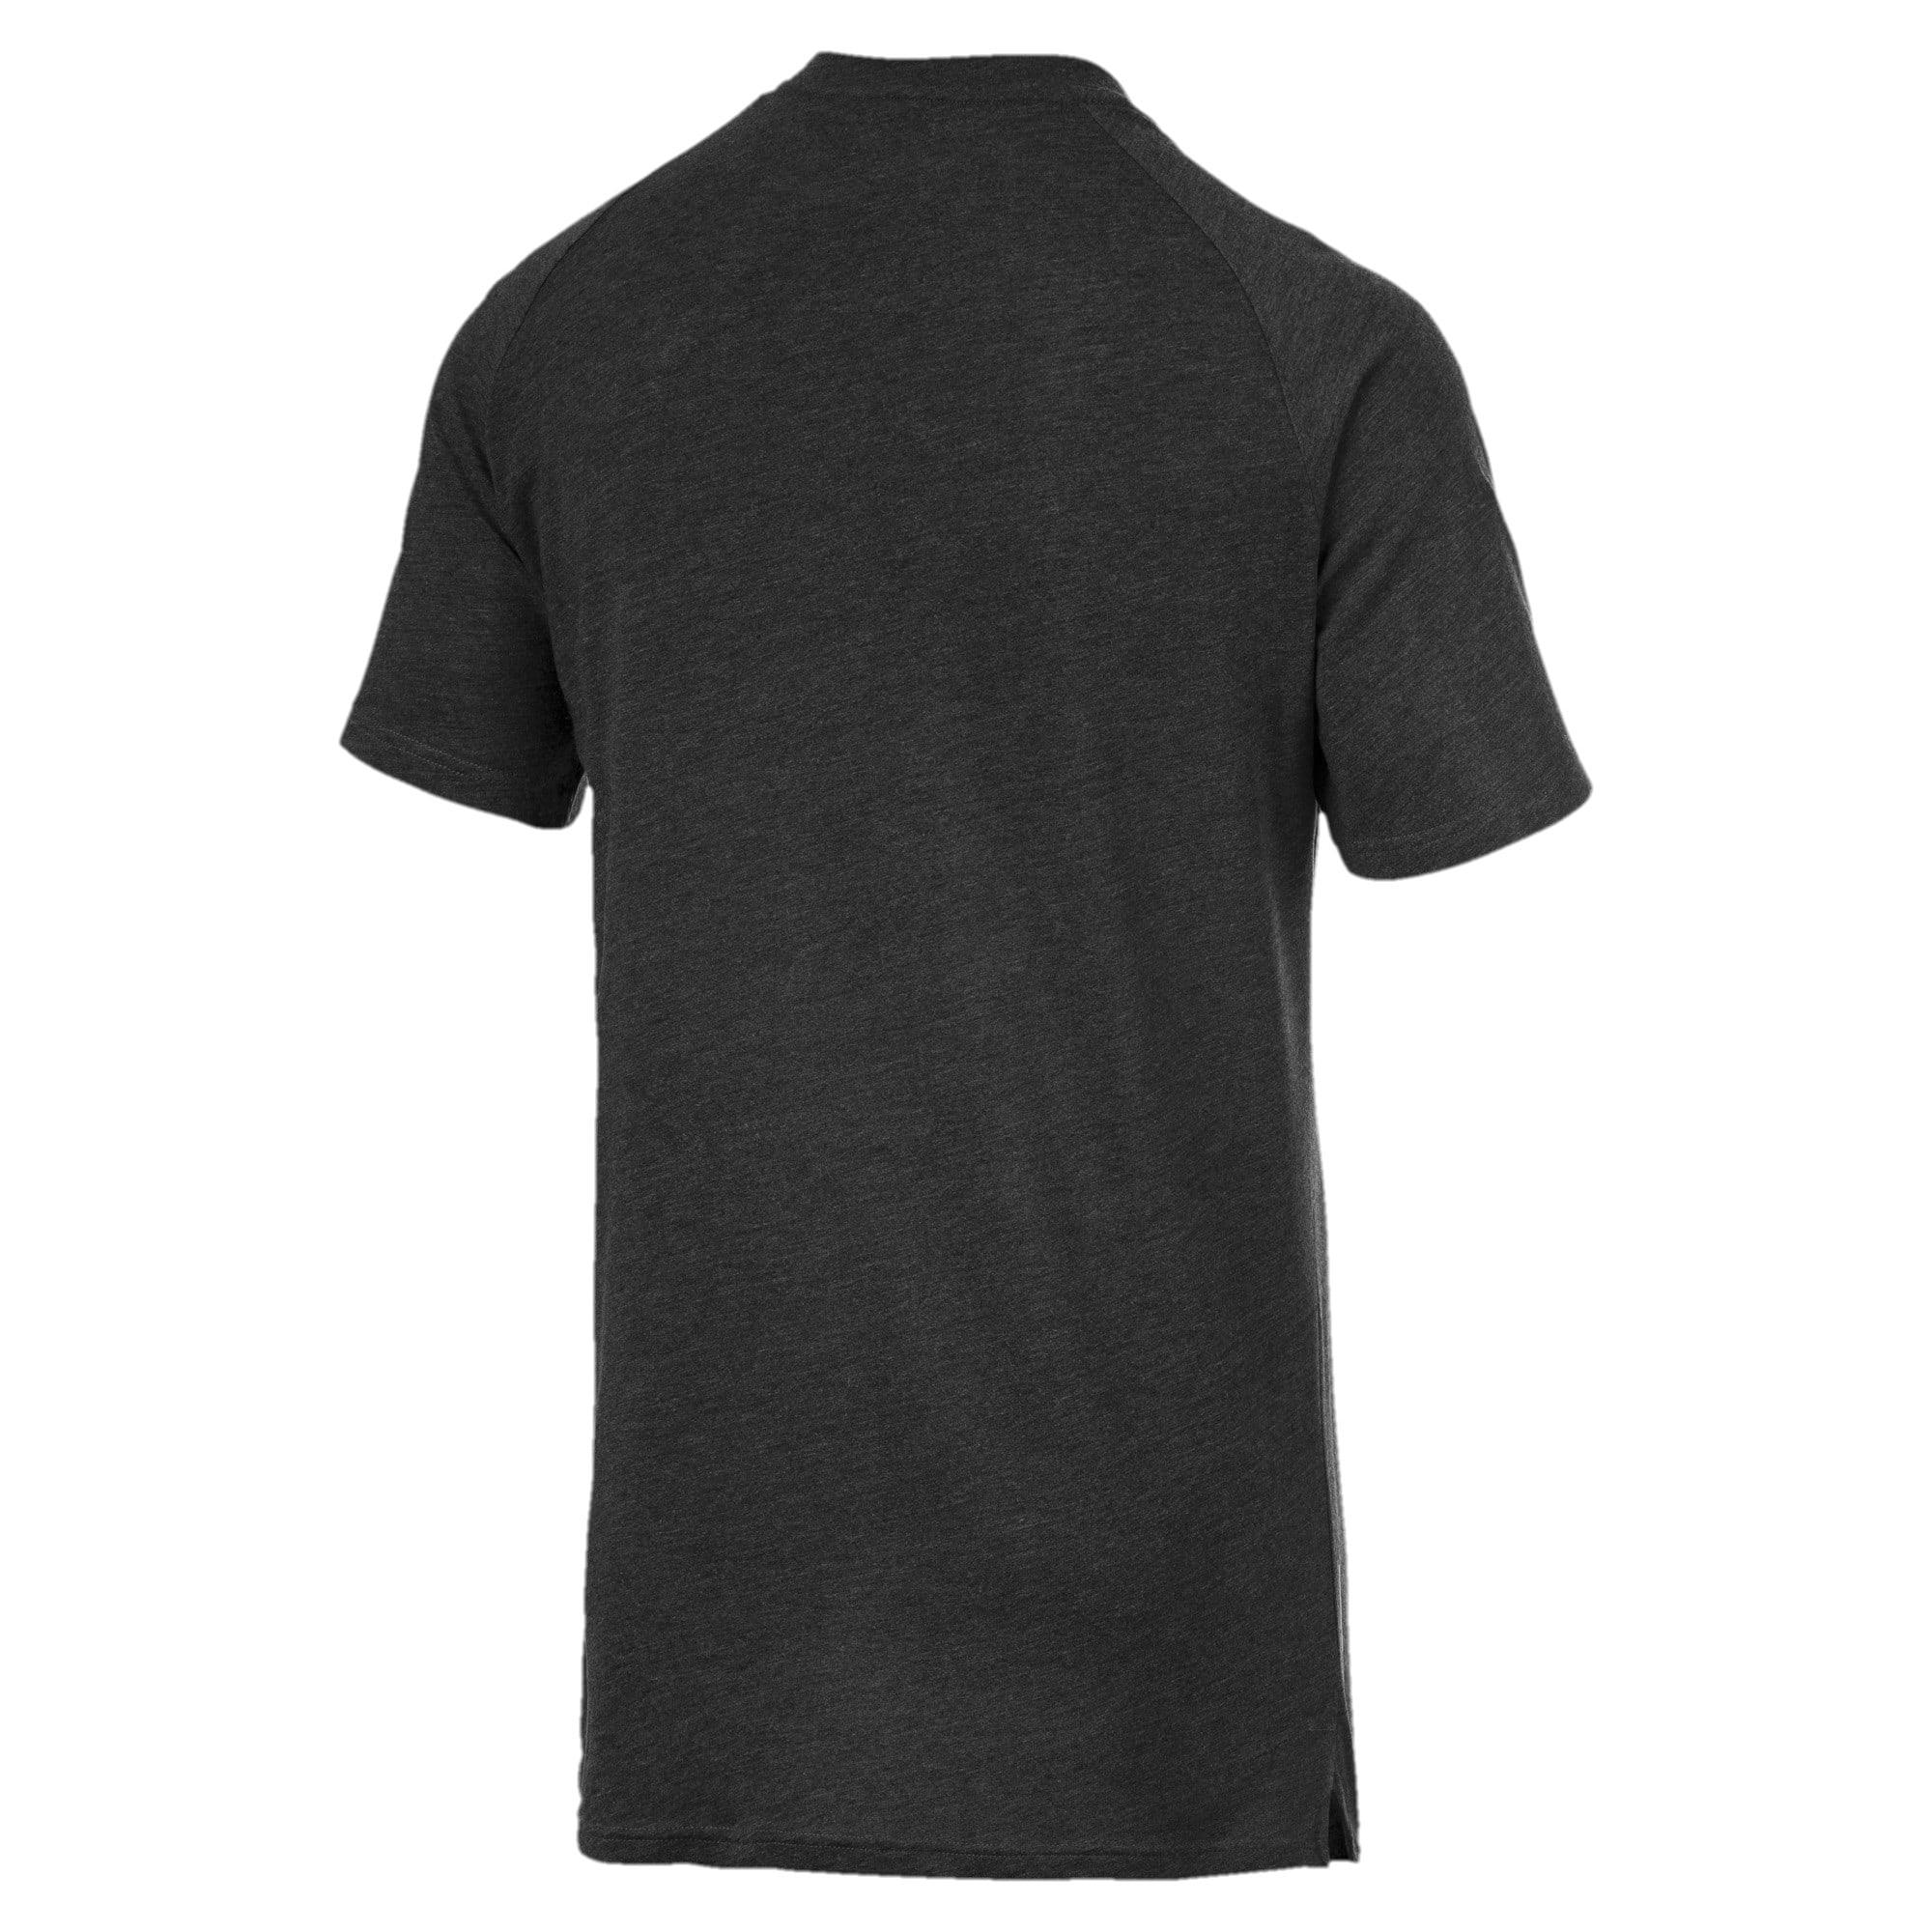 Thumbnail 5 of Meska koszulka Reactive treningowa z krótkim rekawem, Puma Black Heather, medium